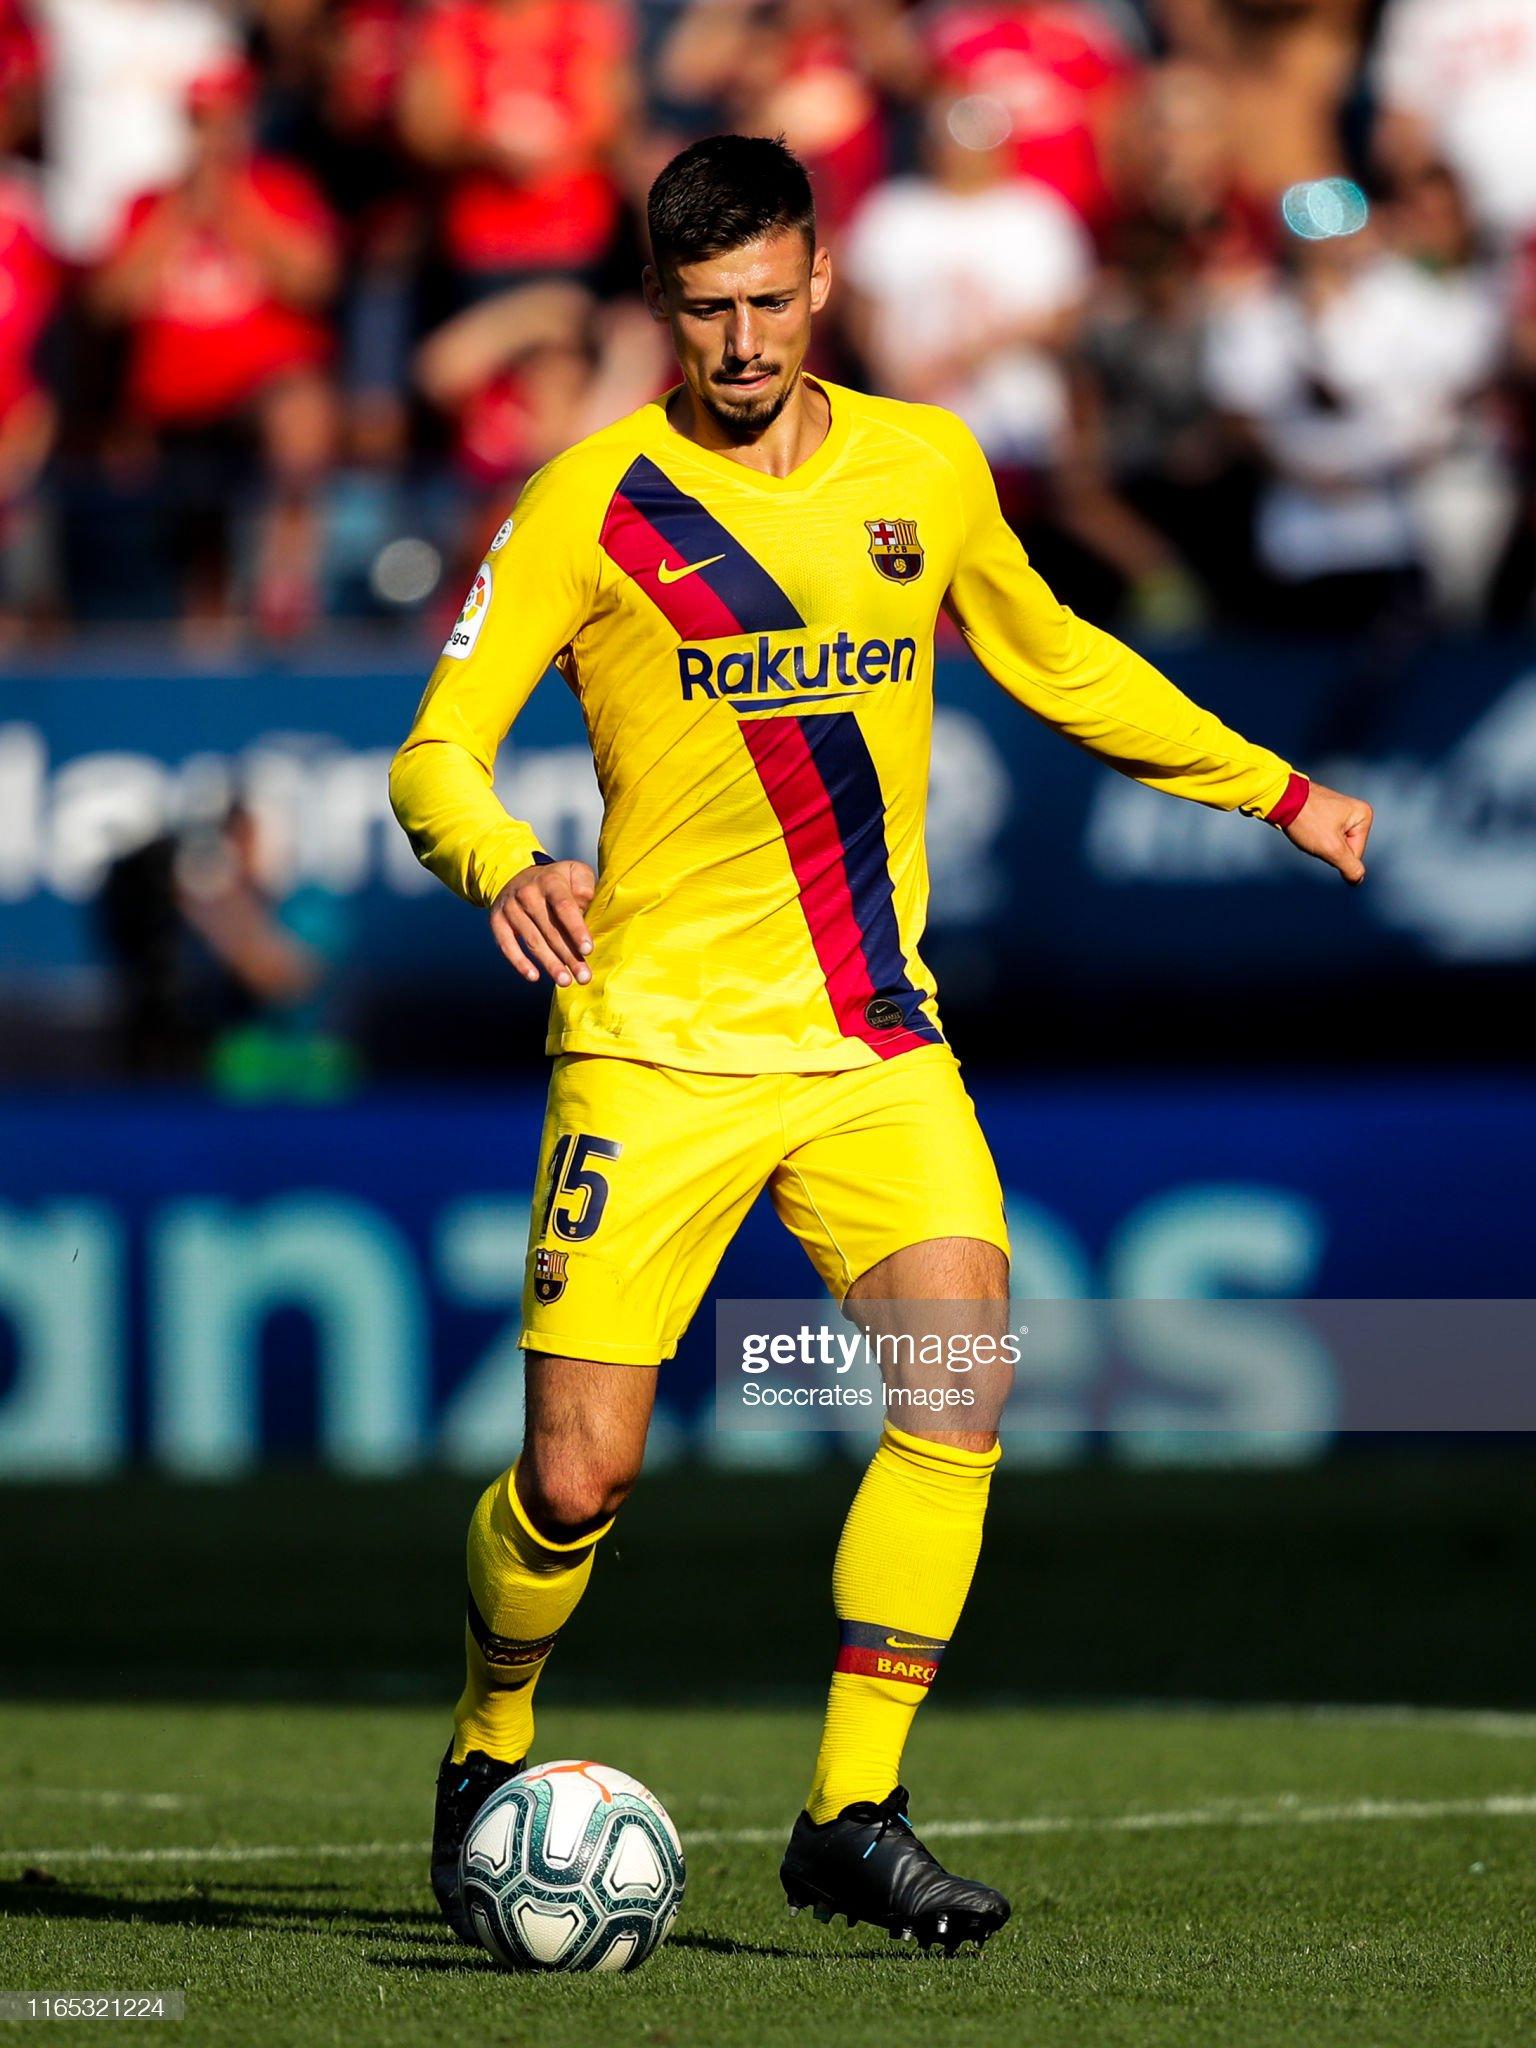 صور مباراة : أوساسونا - برشلونة 2-2 ( 31-08-2019 )  Clement-lenglet-of-fc-barcelona-during-the-la-liga-santander-match-picture-id1165321224?s=2048x2048